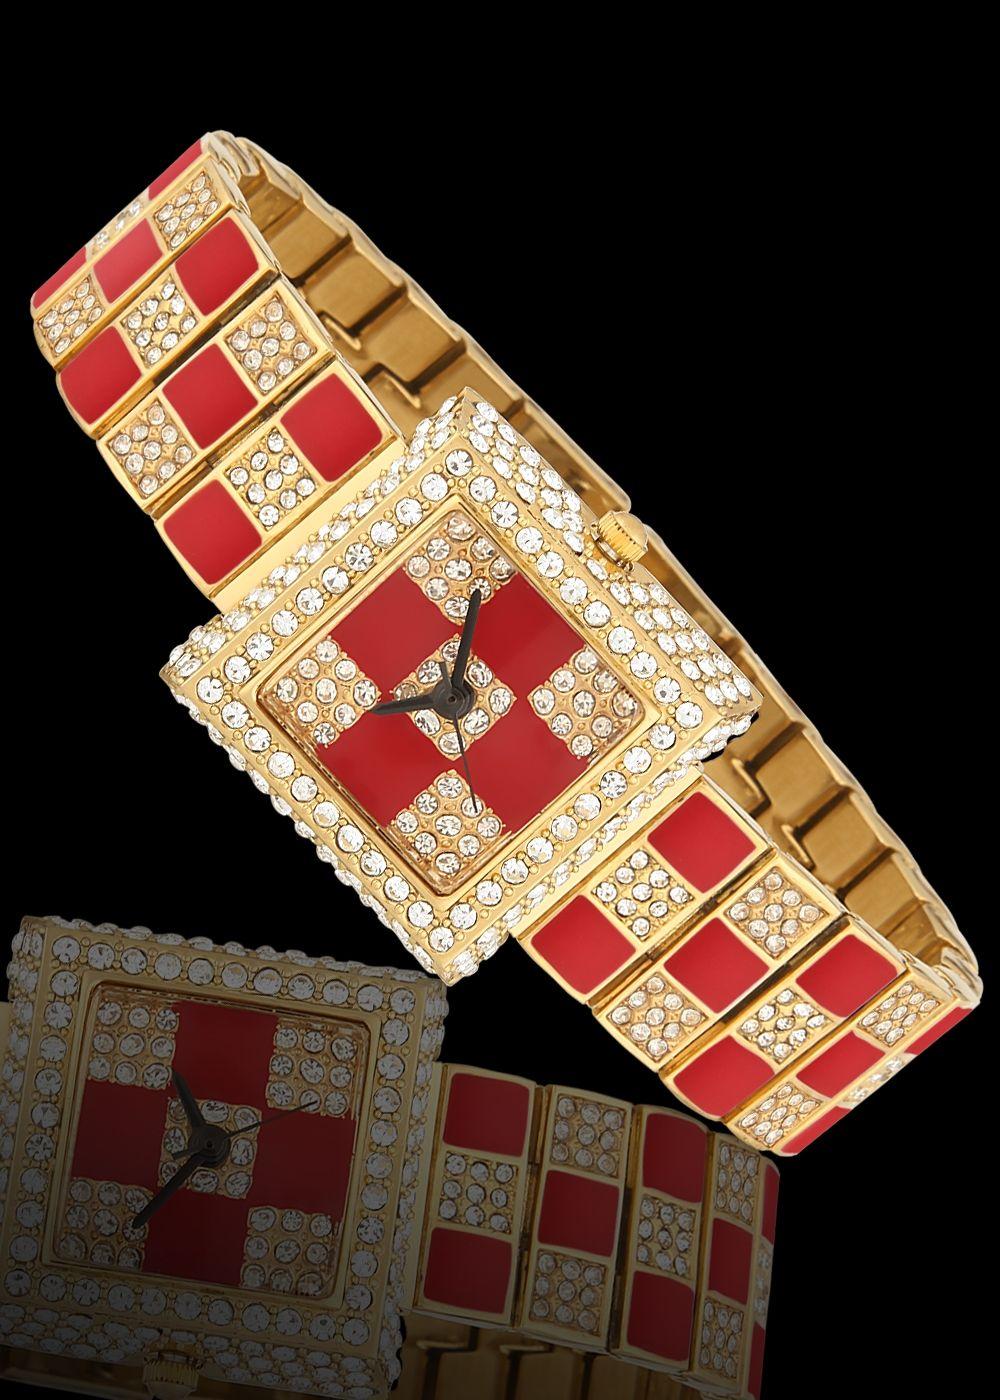 Bayan kol saatleri panosundaki pin